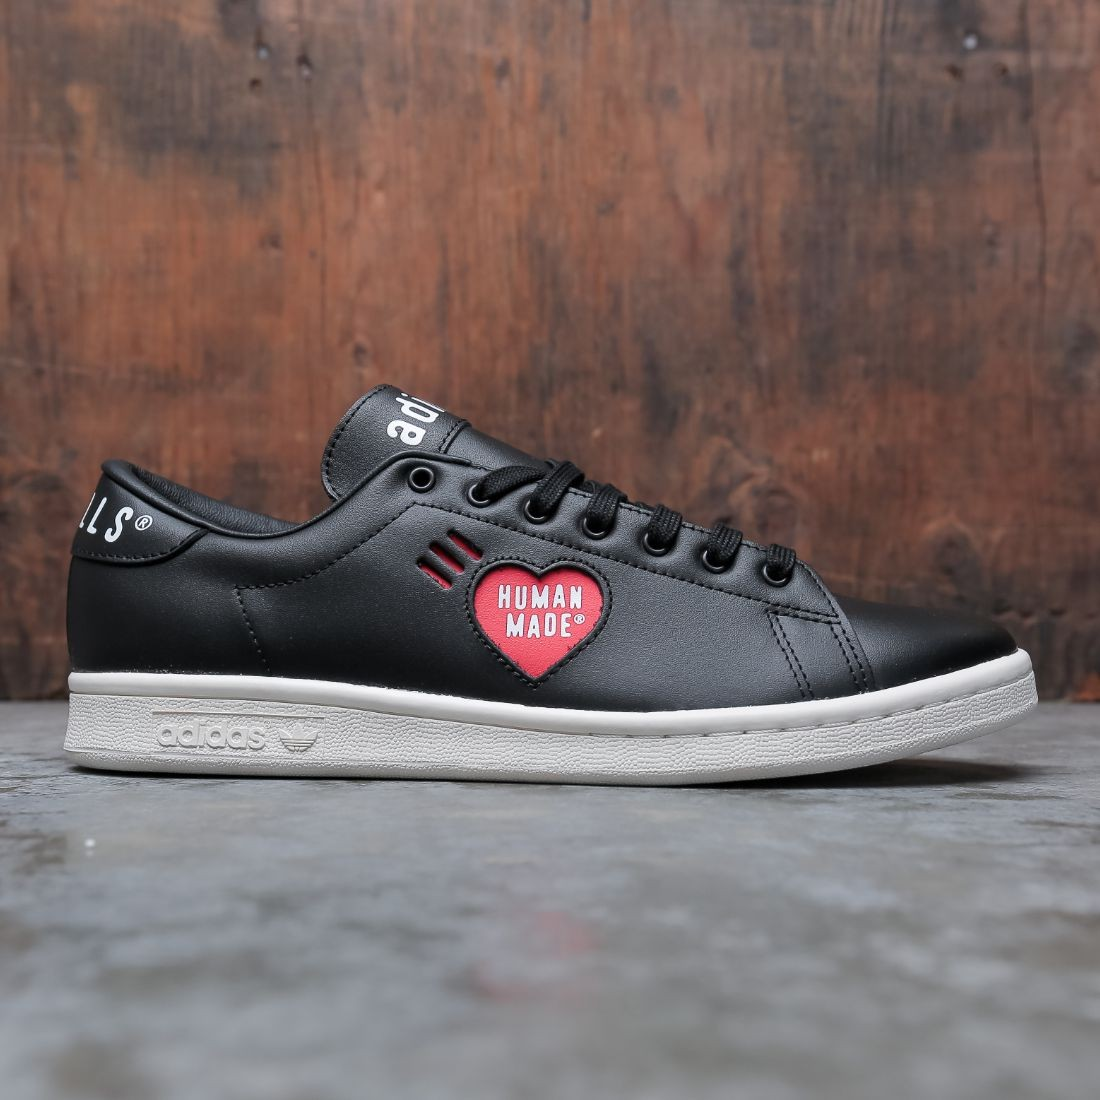 Adidas x Human Made Men Stan Smith (black / footwear white / off white)